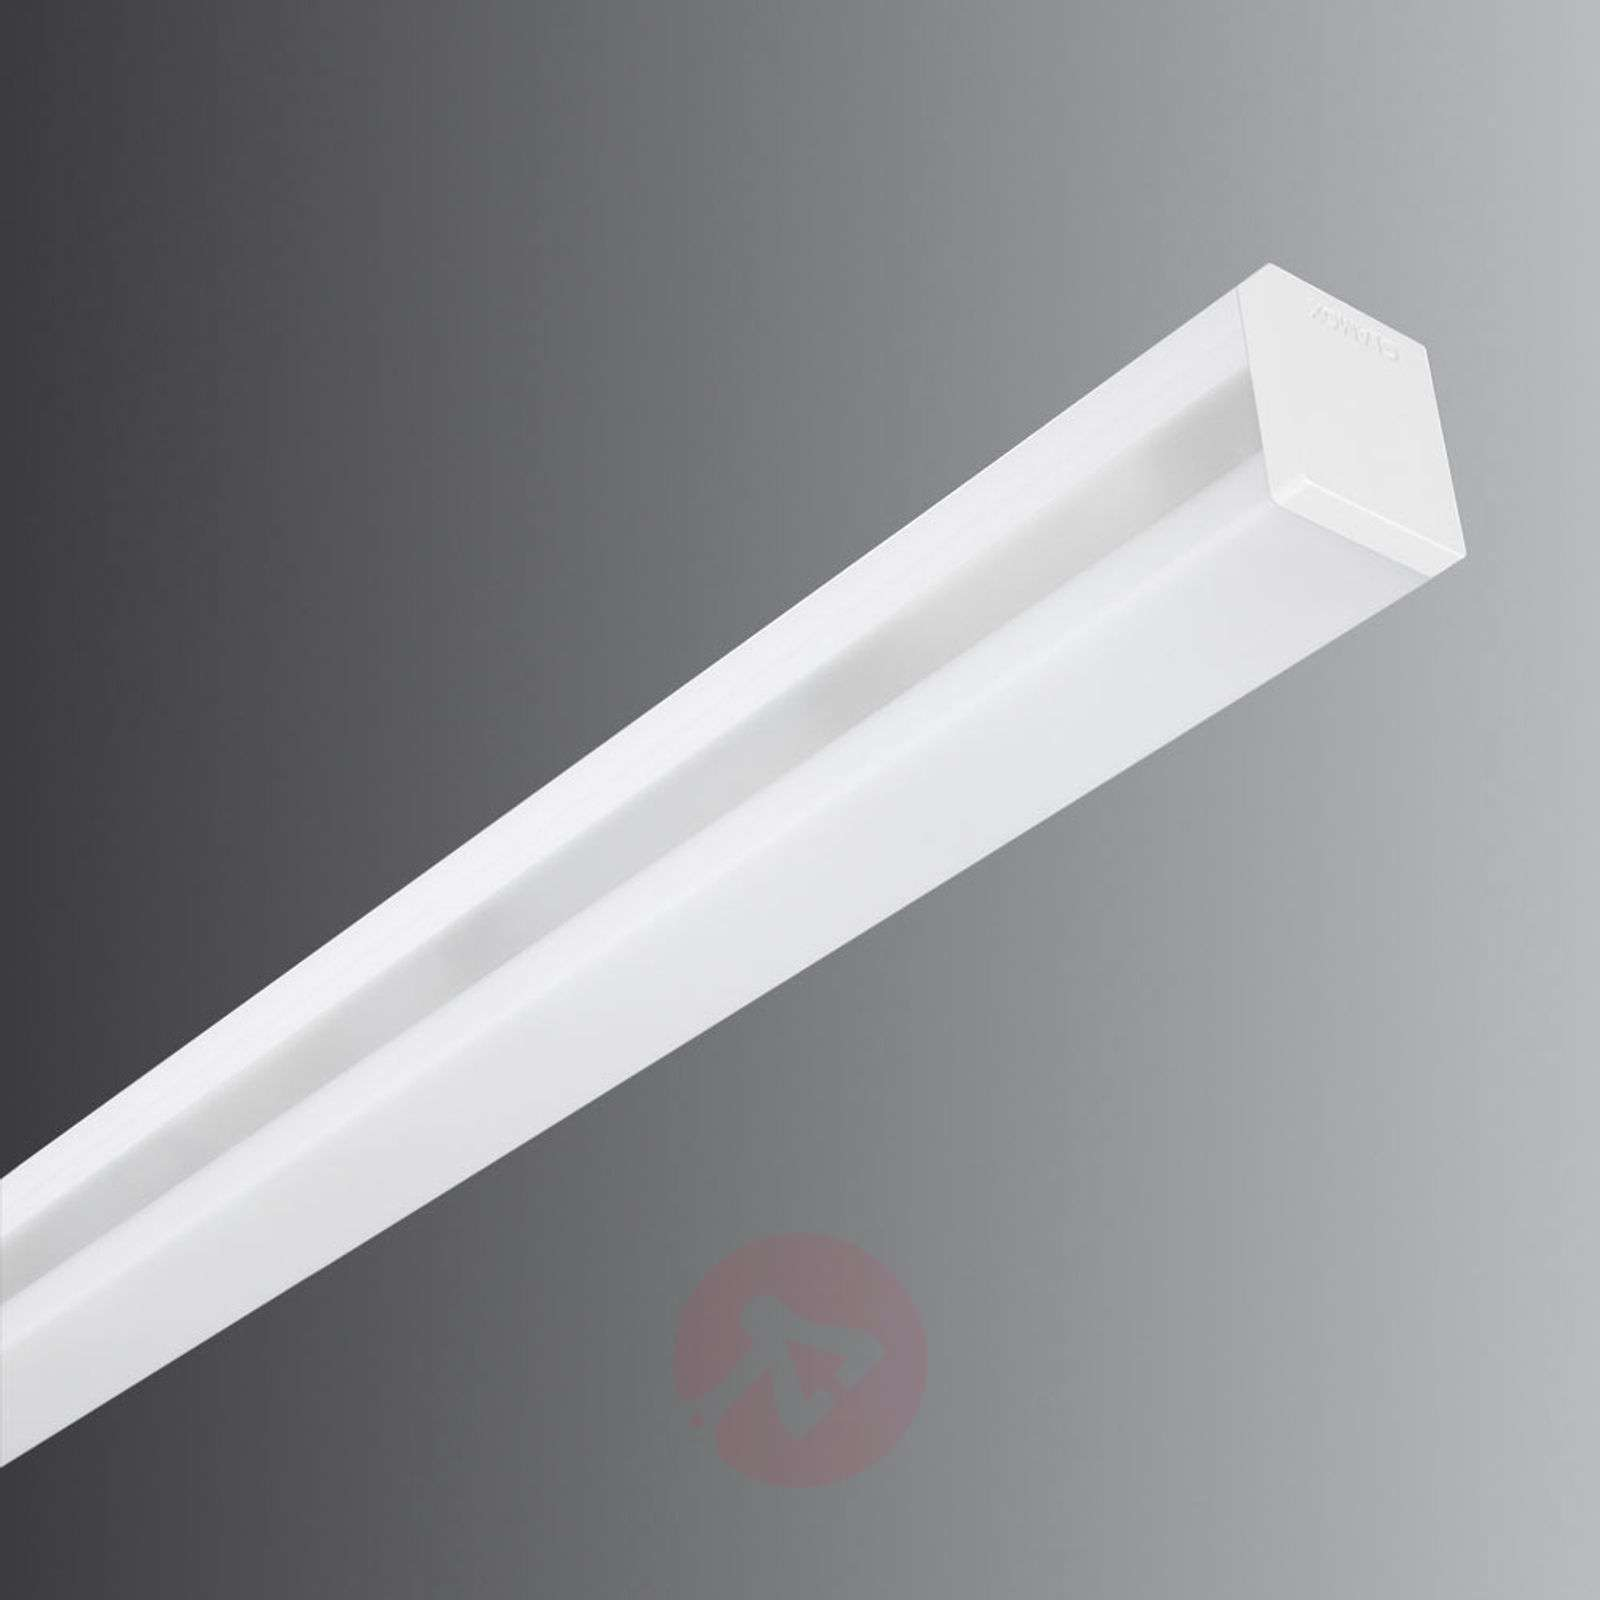 16 W LED-peililamppu A40-W1200 2100HF 120cm-6040213X-01